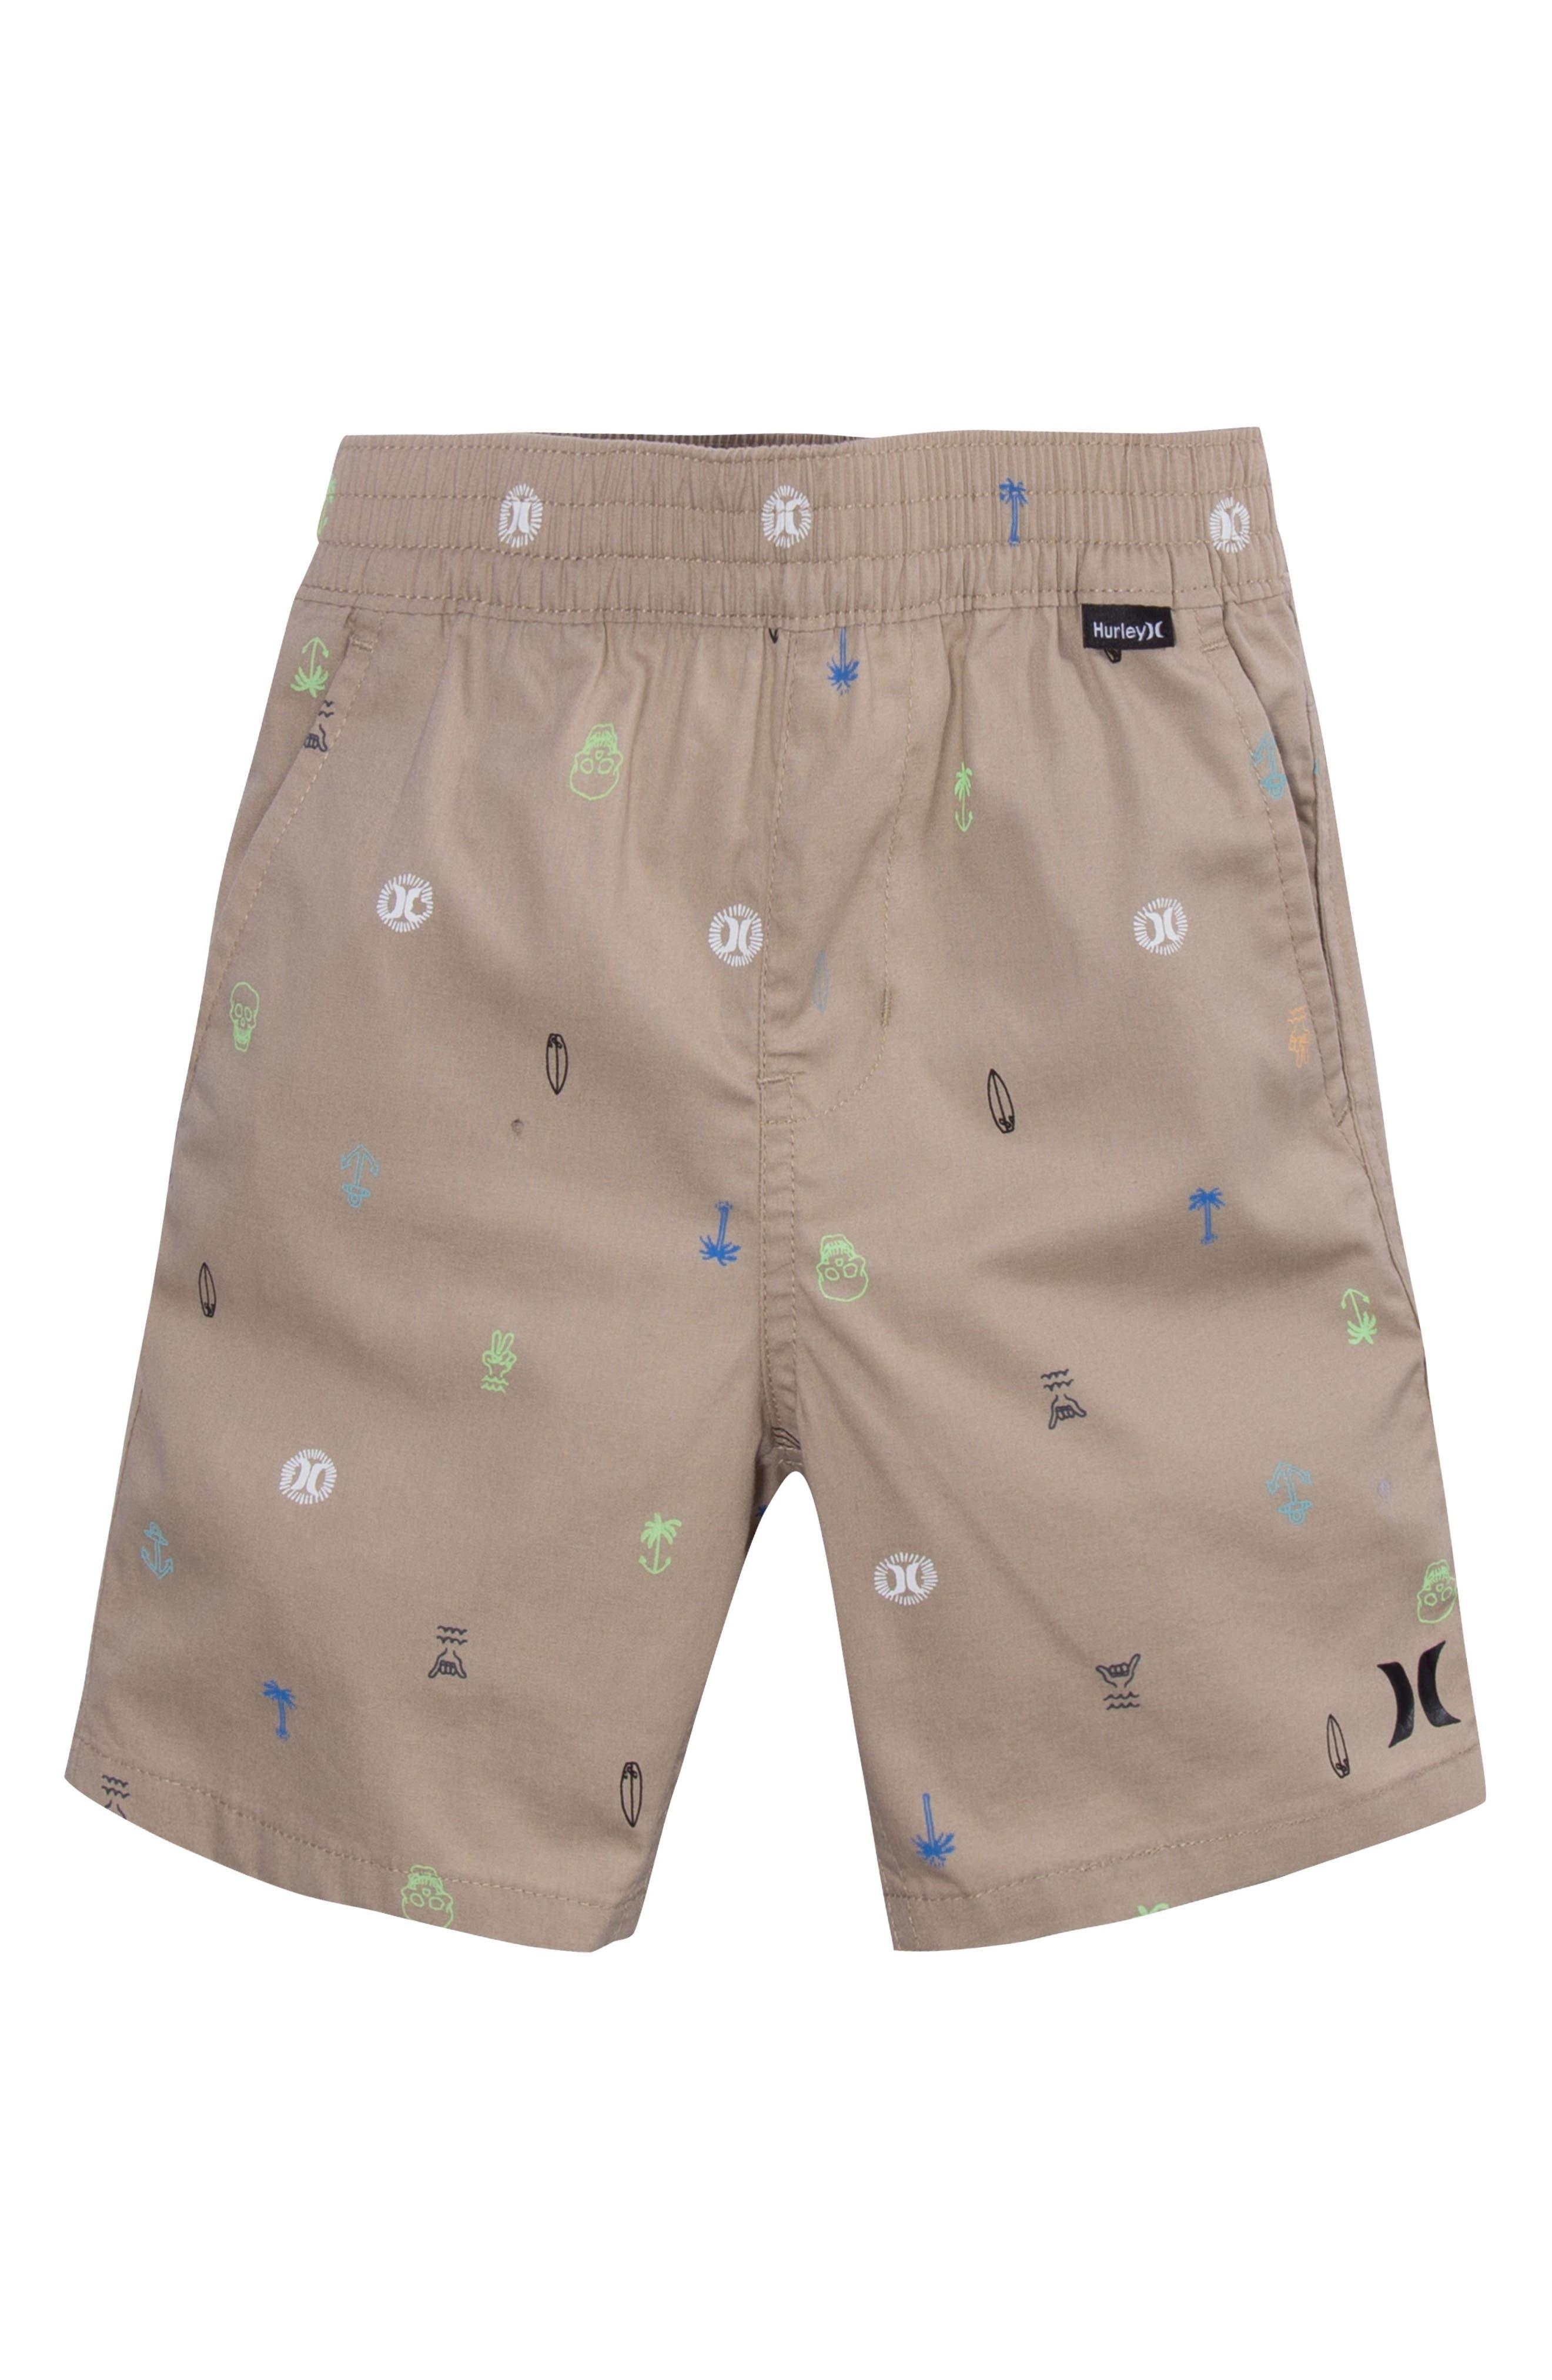 Hurley Print Pull-On Shorts (Big Boys)